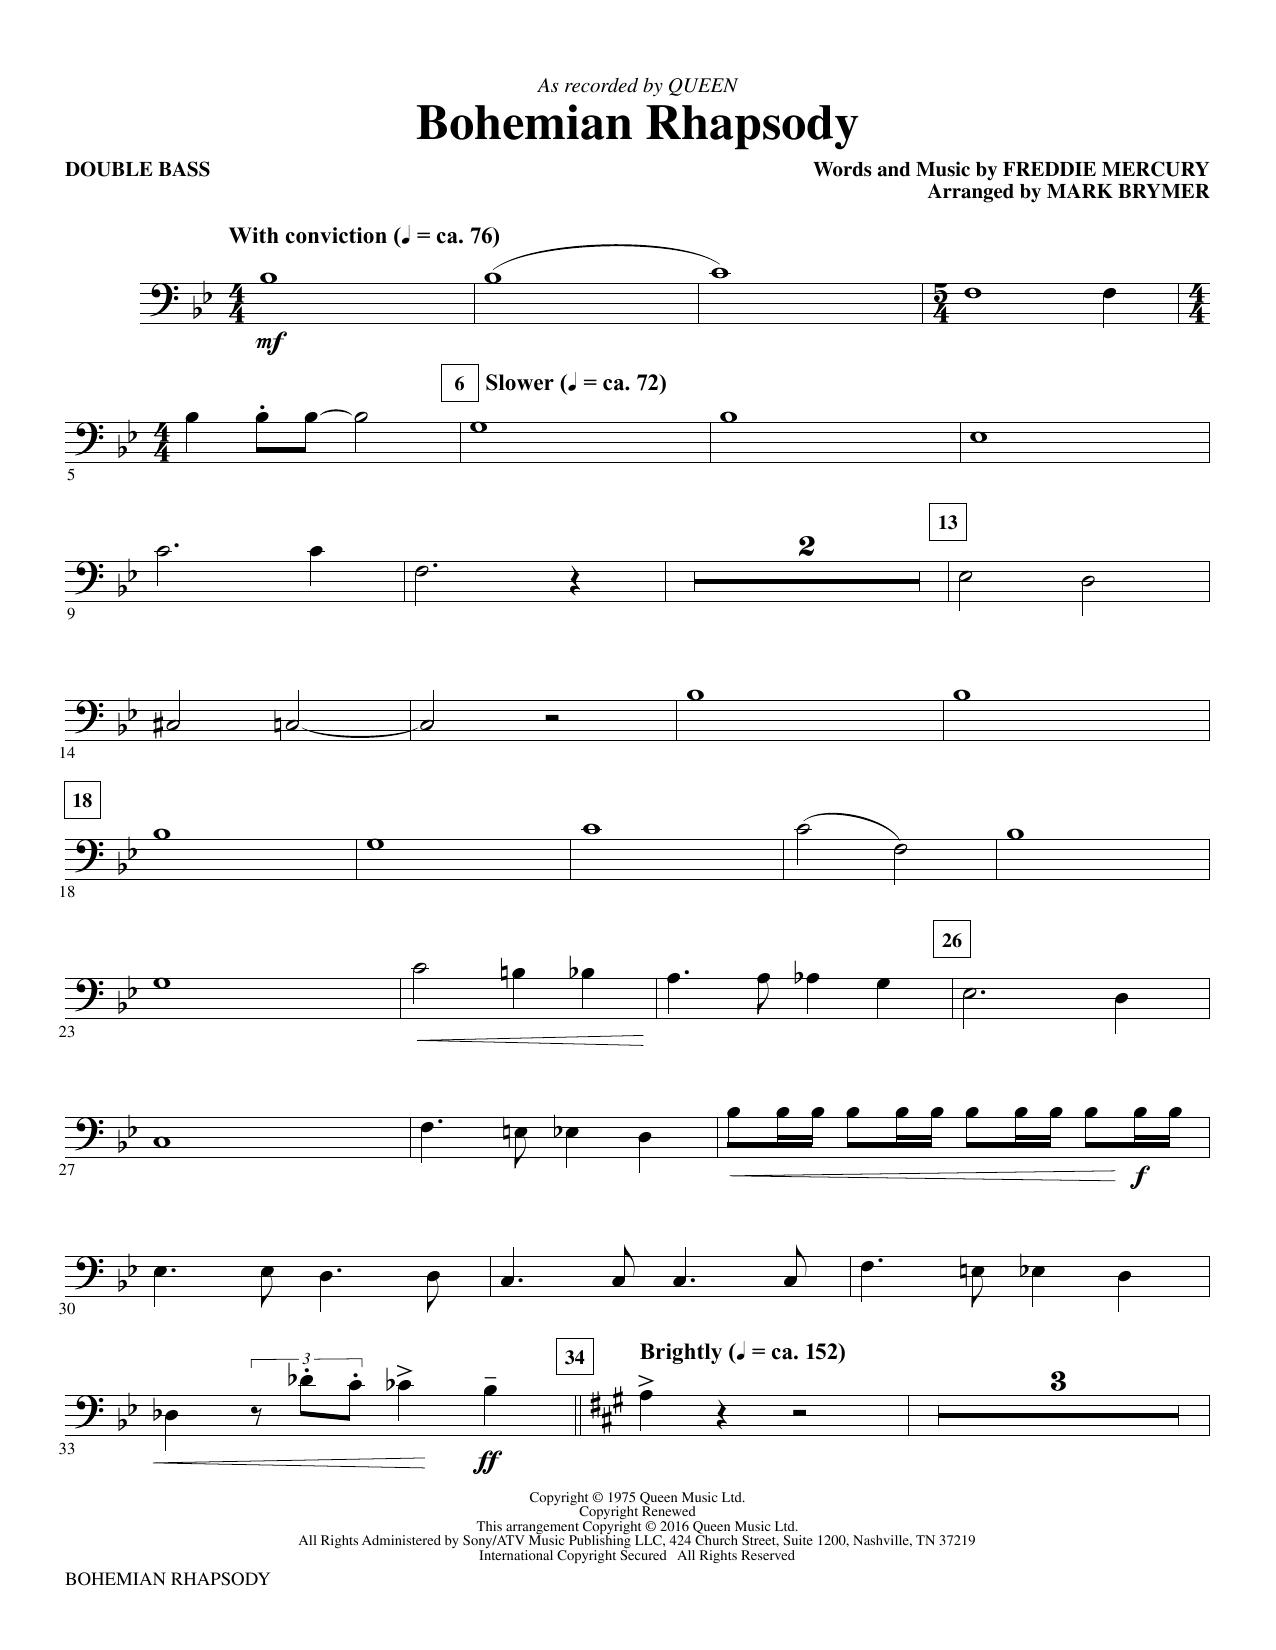 Queen - Bohemian Rhapsody - Double Bass